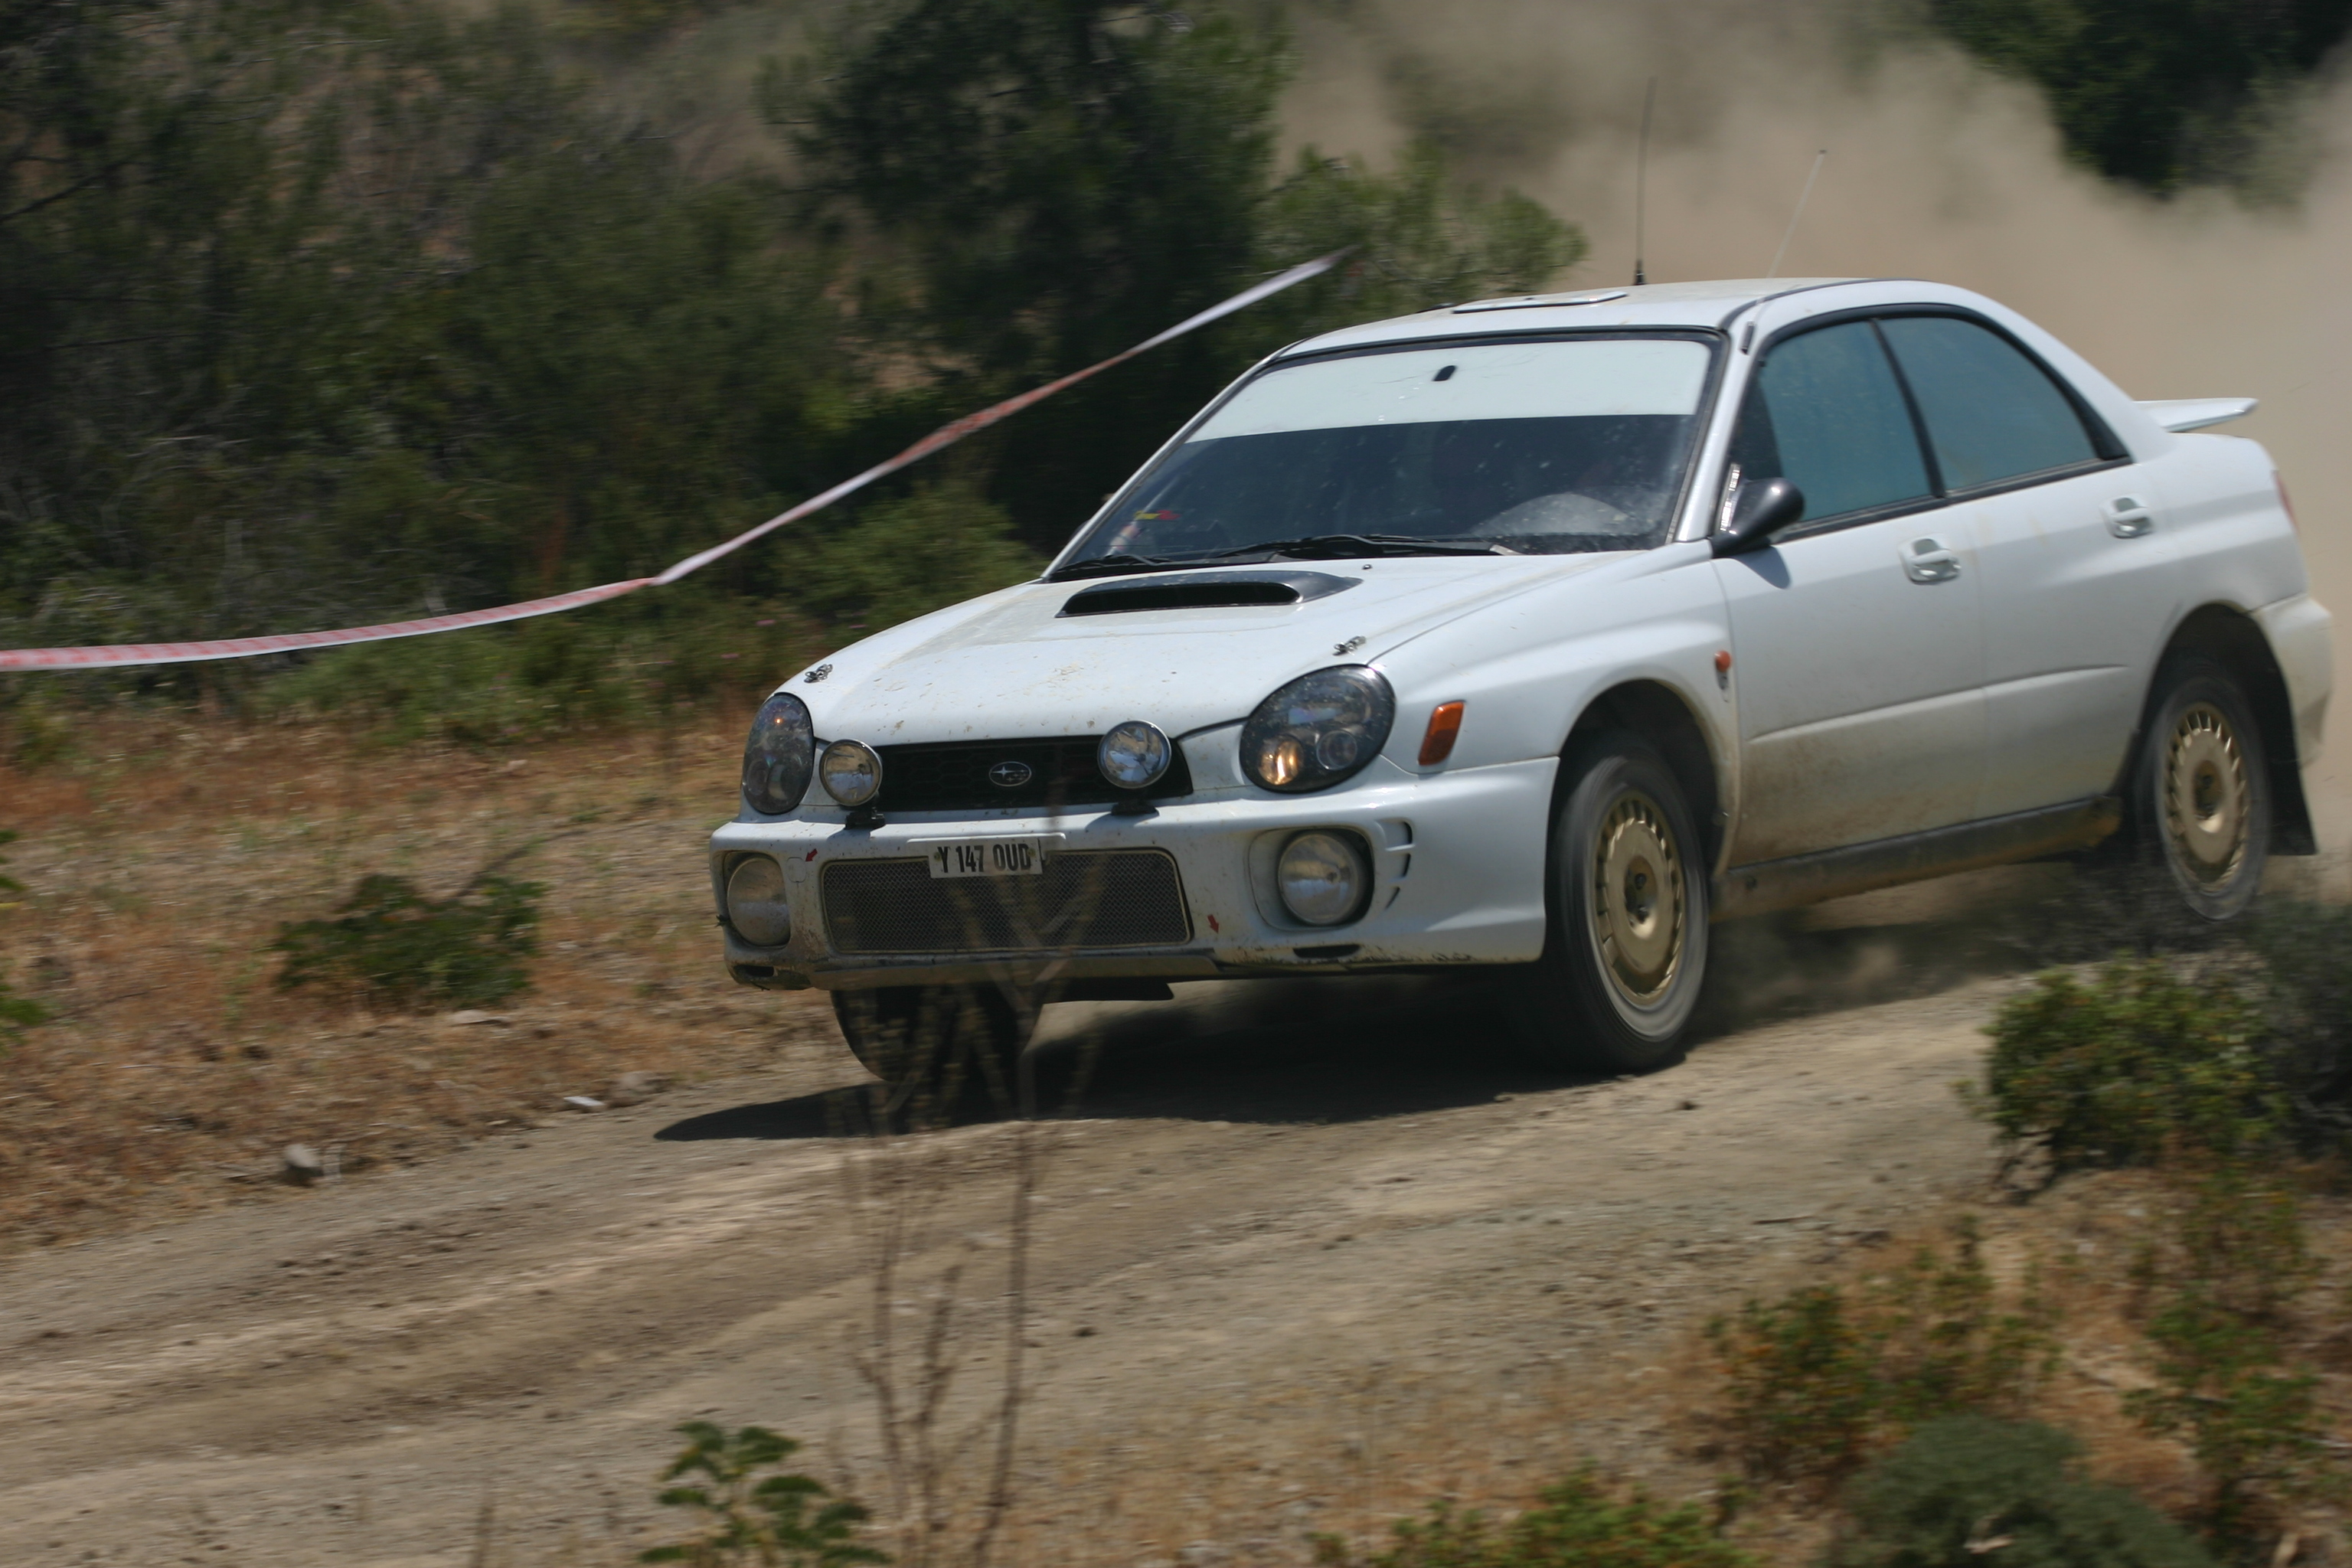 File Subaru Impreza Wrx Sti N8 2004 Cyprus Rally 003 Jpg